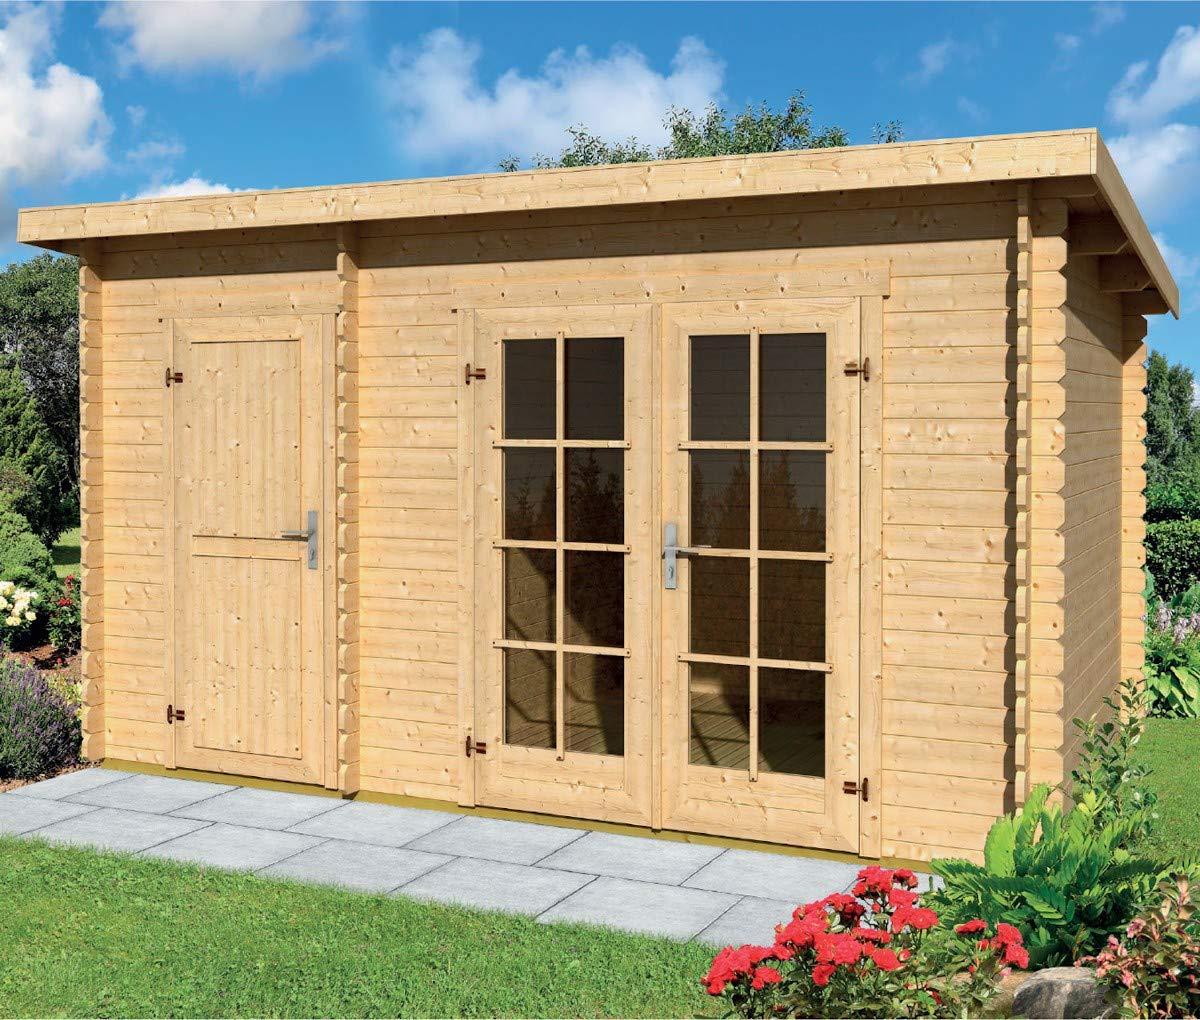 Casa jardín Belmont madera nórdica Gartenpro 443 x 298 x 222/200H: Amazon.es: Jardín